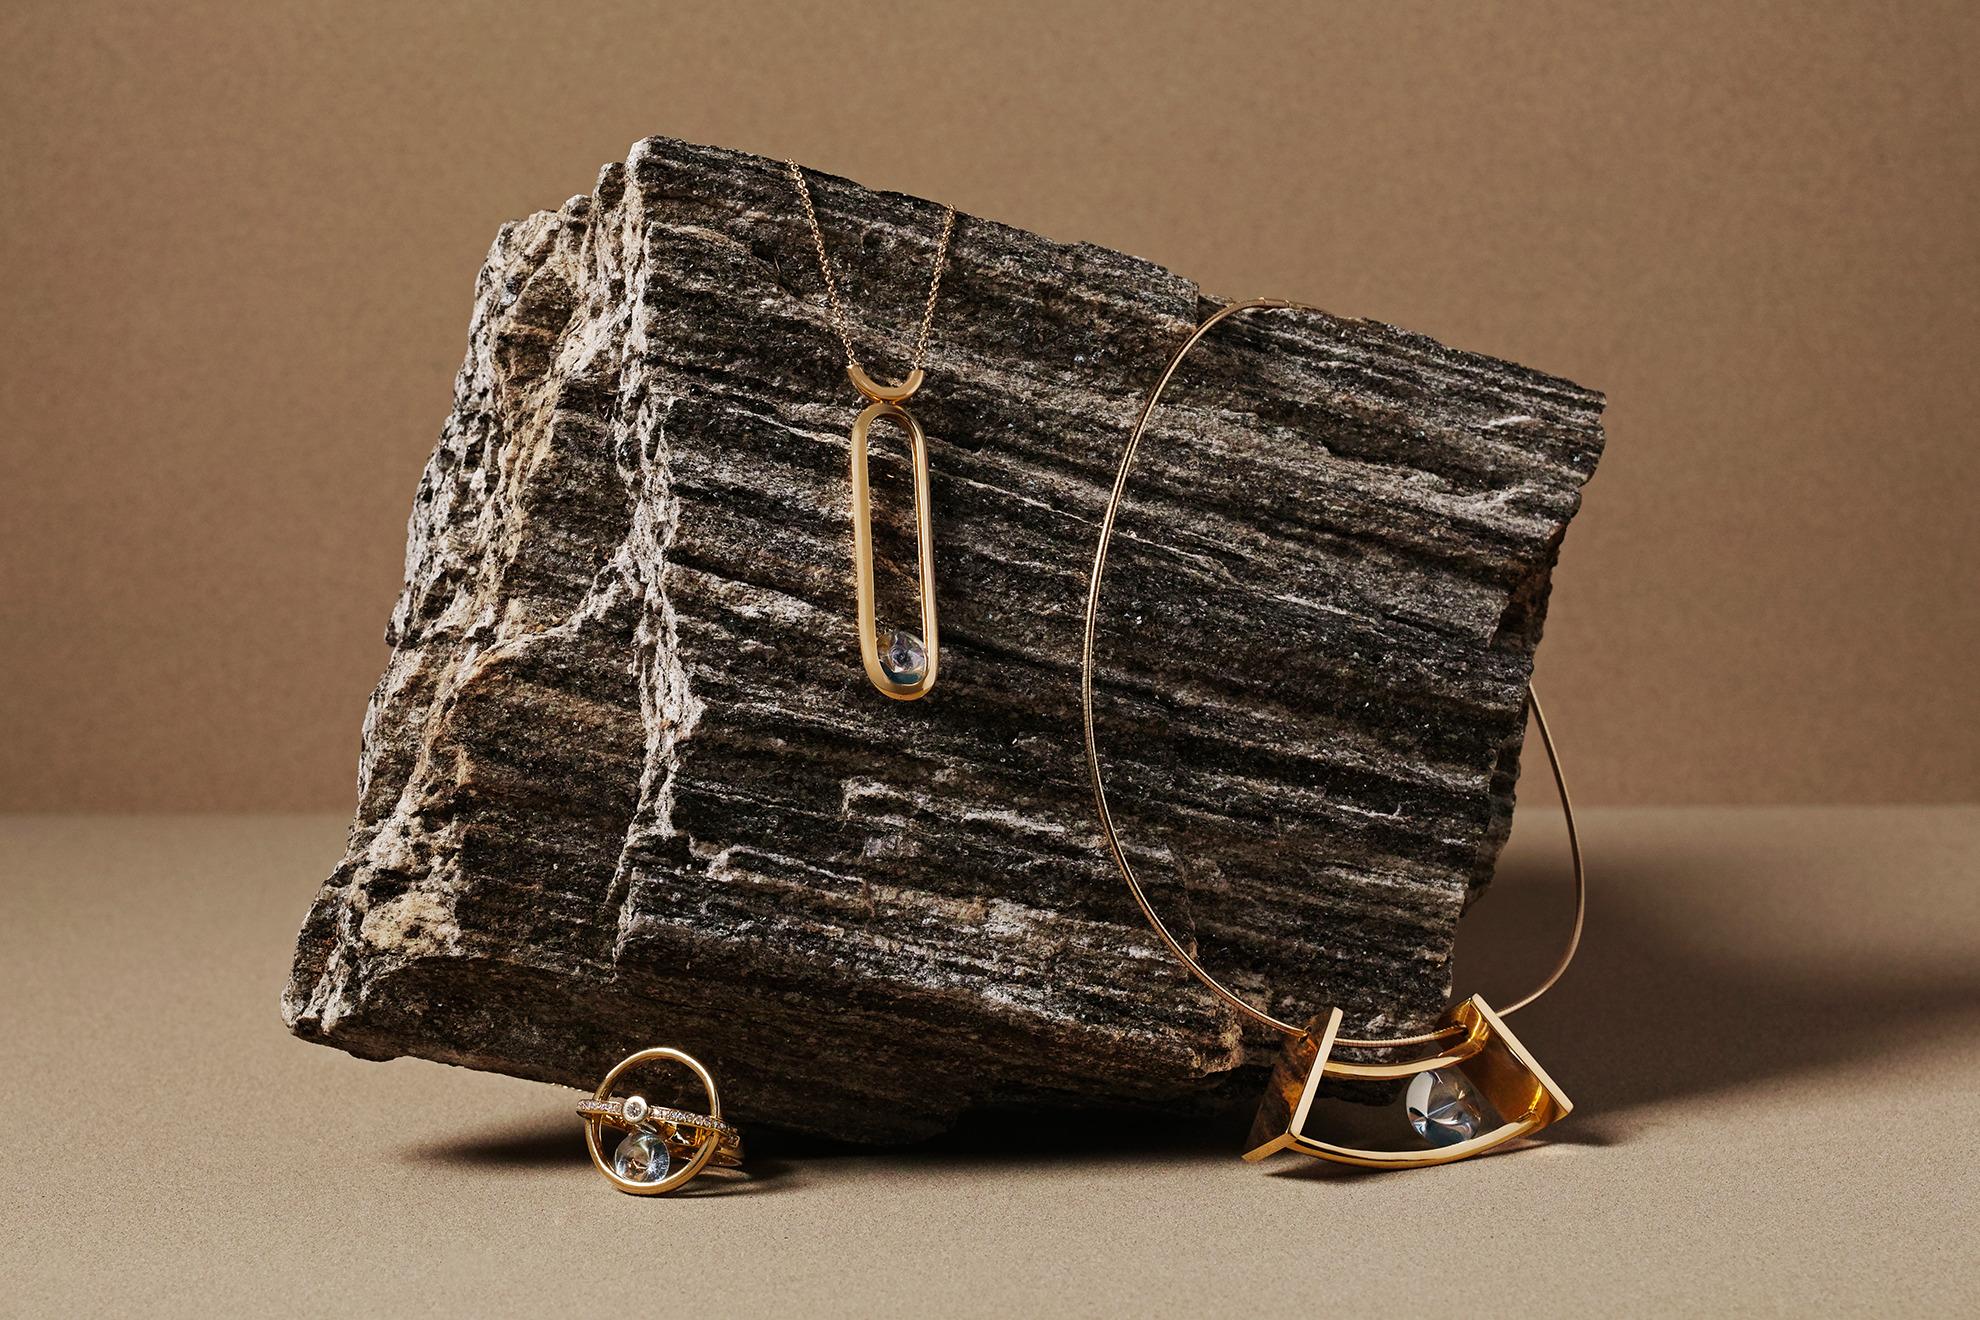 spinning jewelry